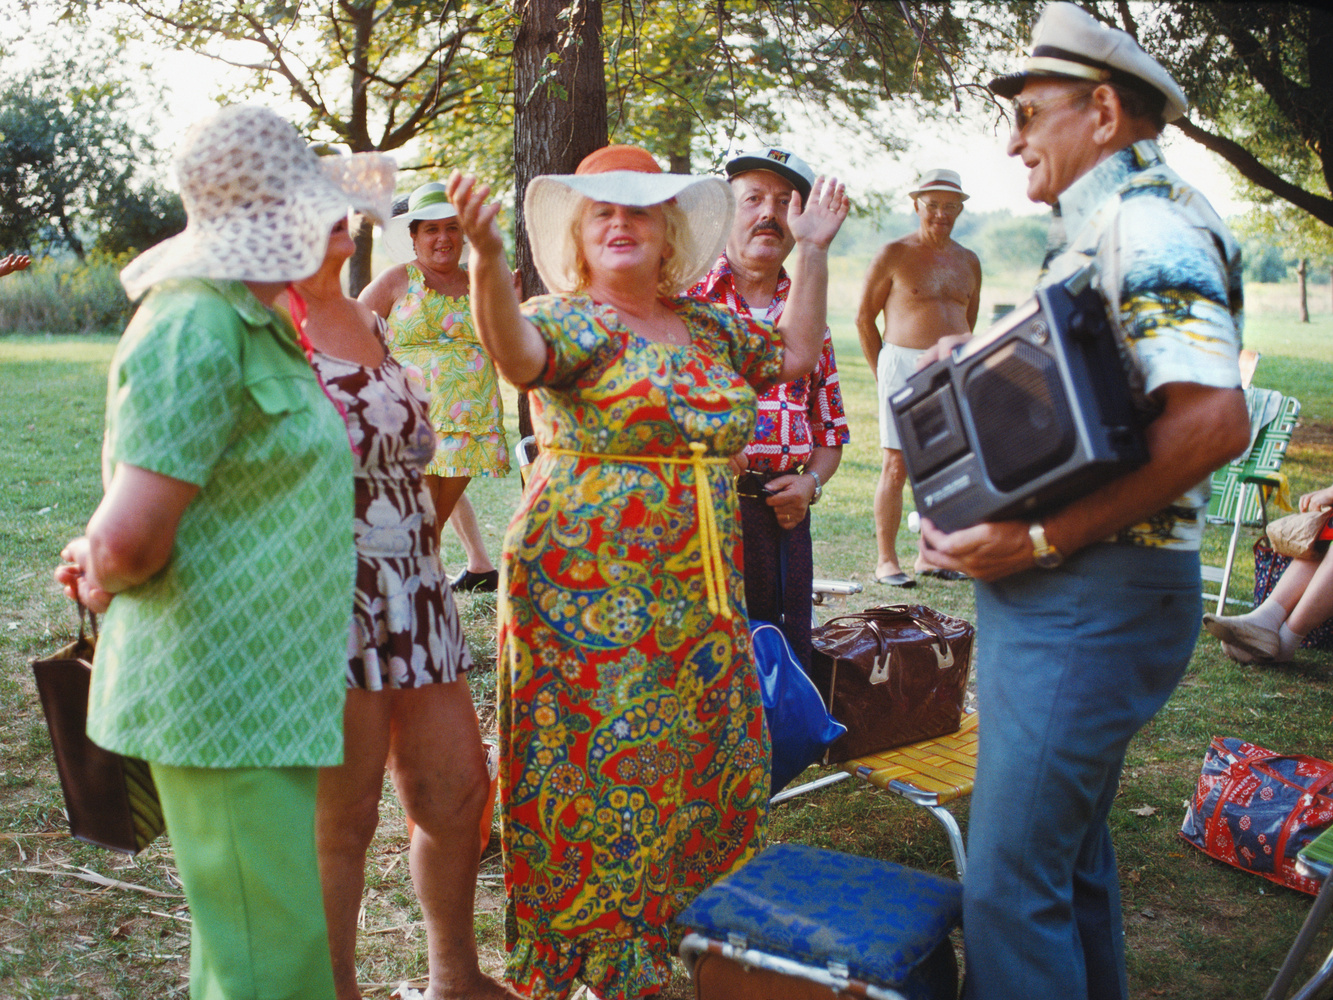 Joyce Dopkeen garden party